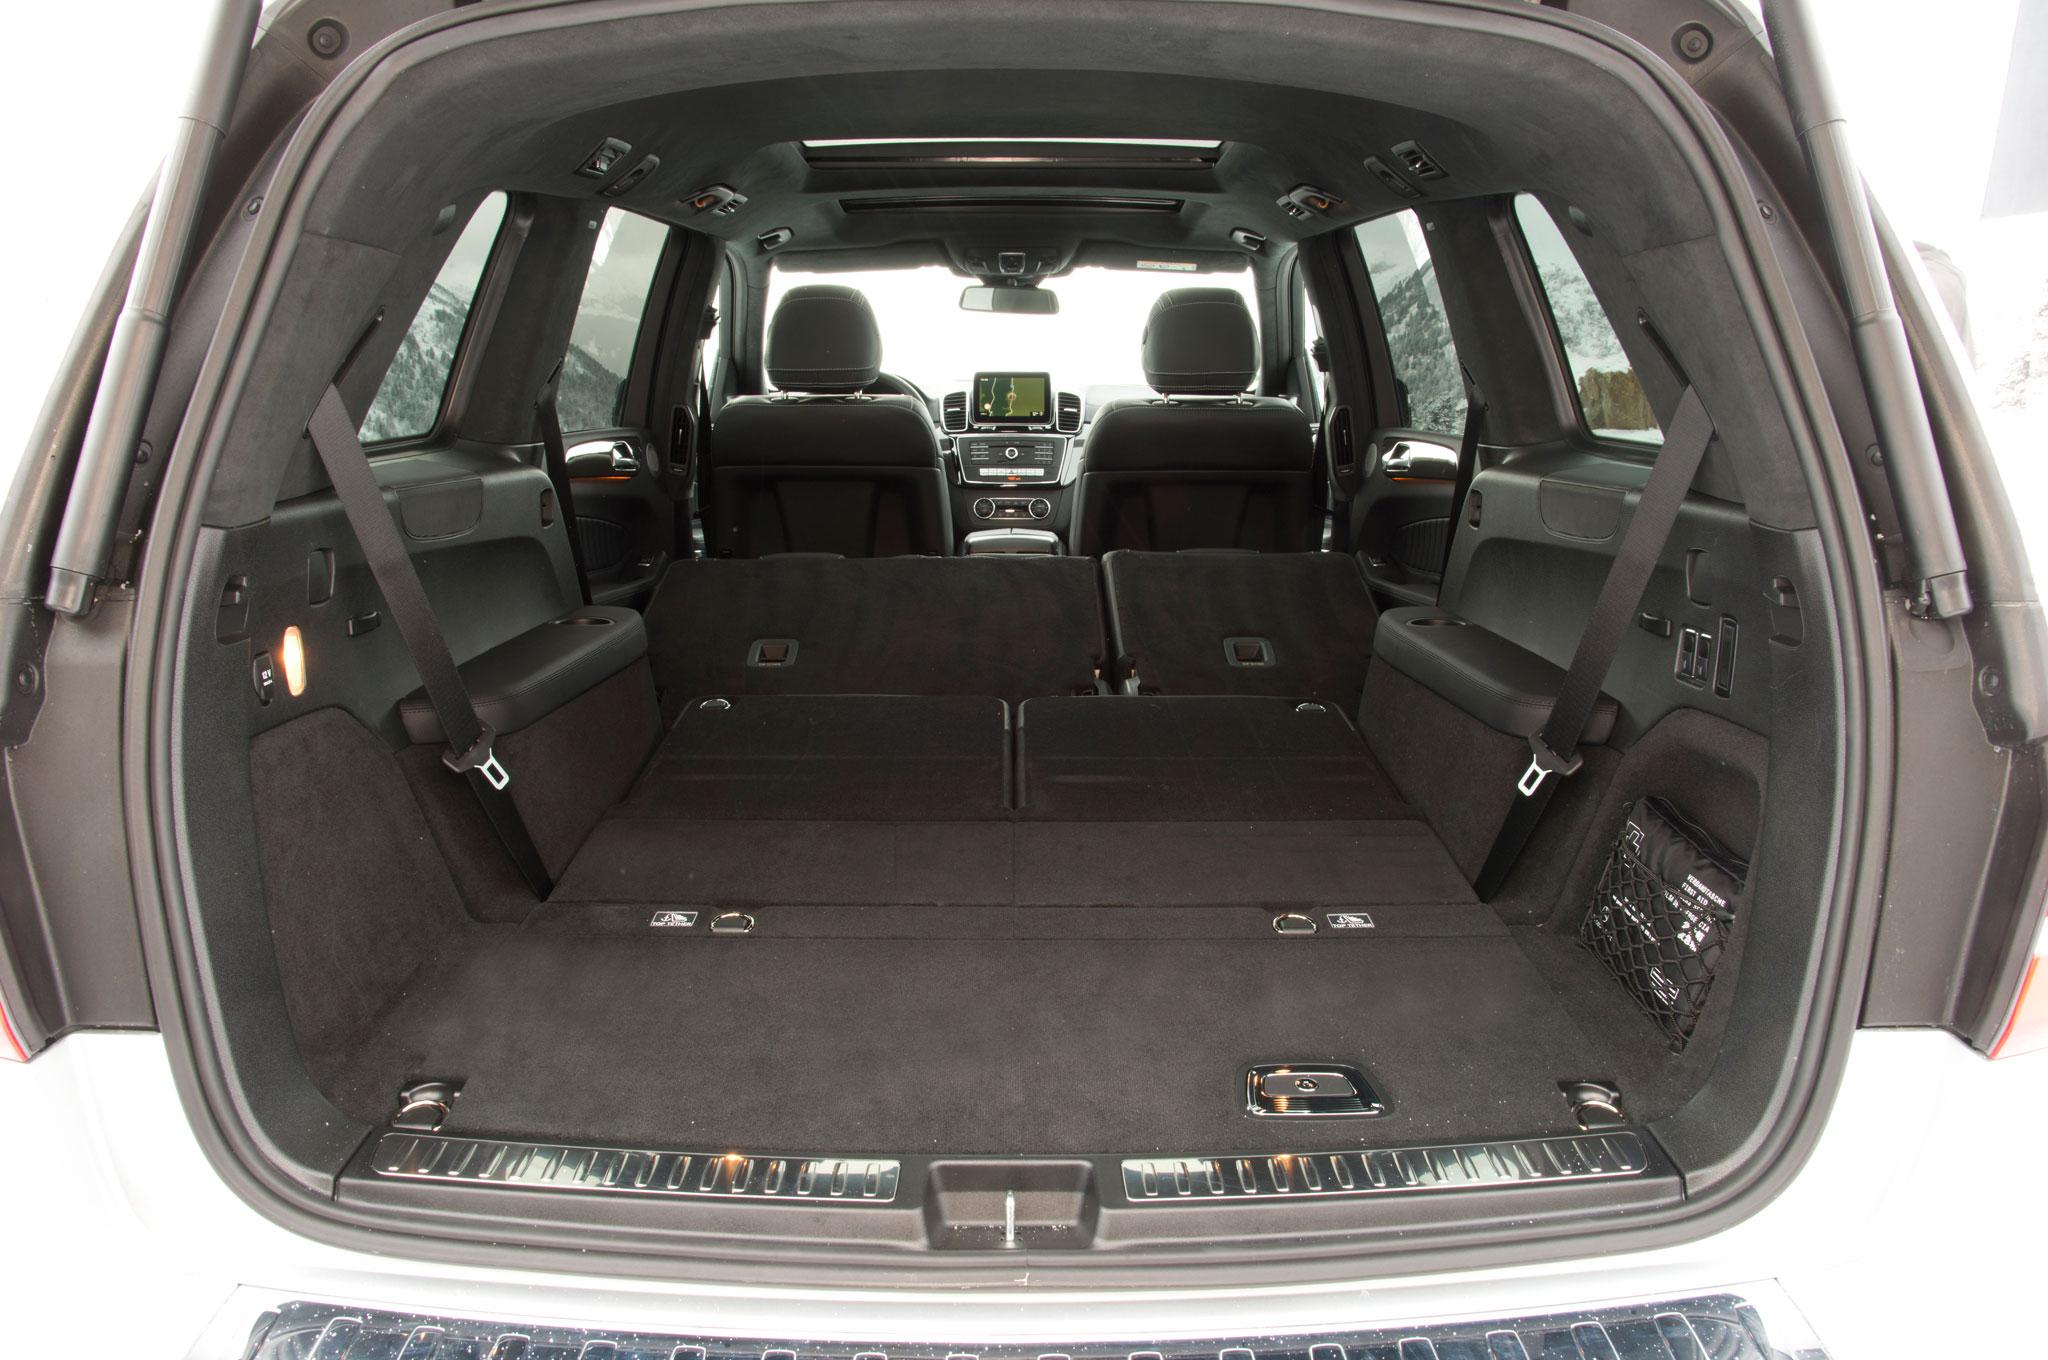 http://st.automobilemag.com/uploads/sites/11/2015/12/2017-Mercedes-Benz-GLS550-4Matic-interior-cargo-area-third-and-second-row-down.jpg